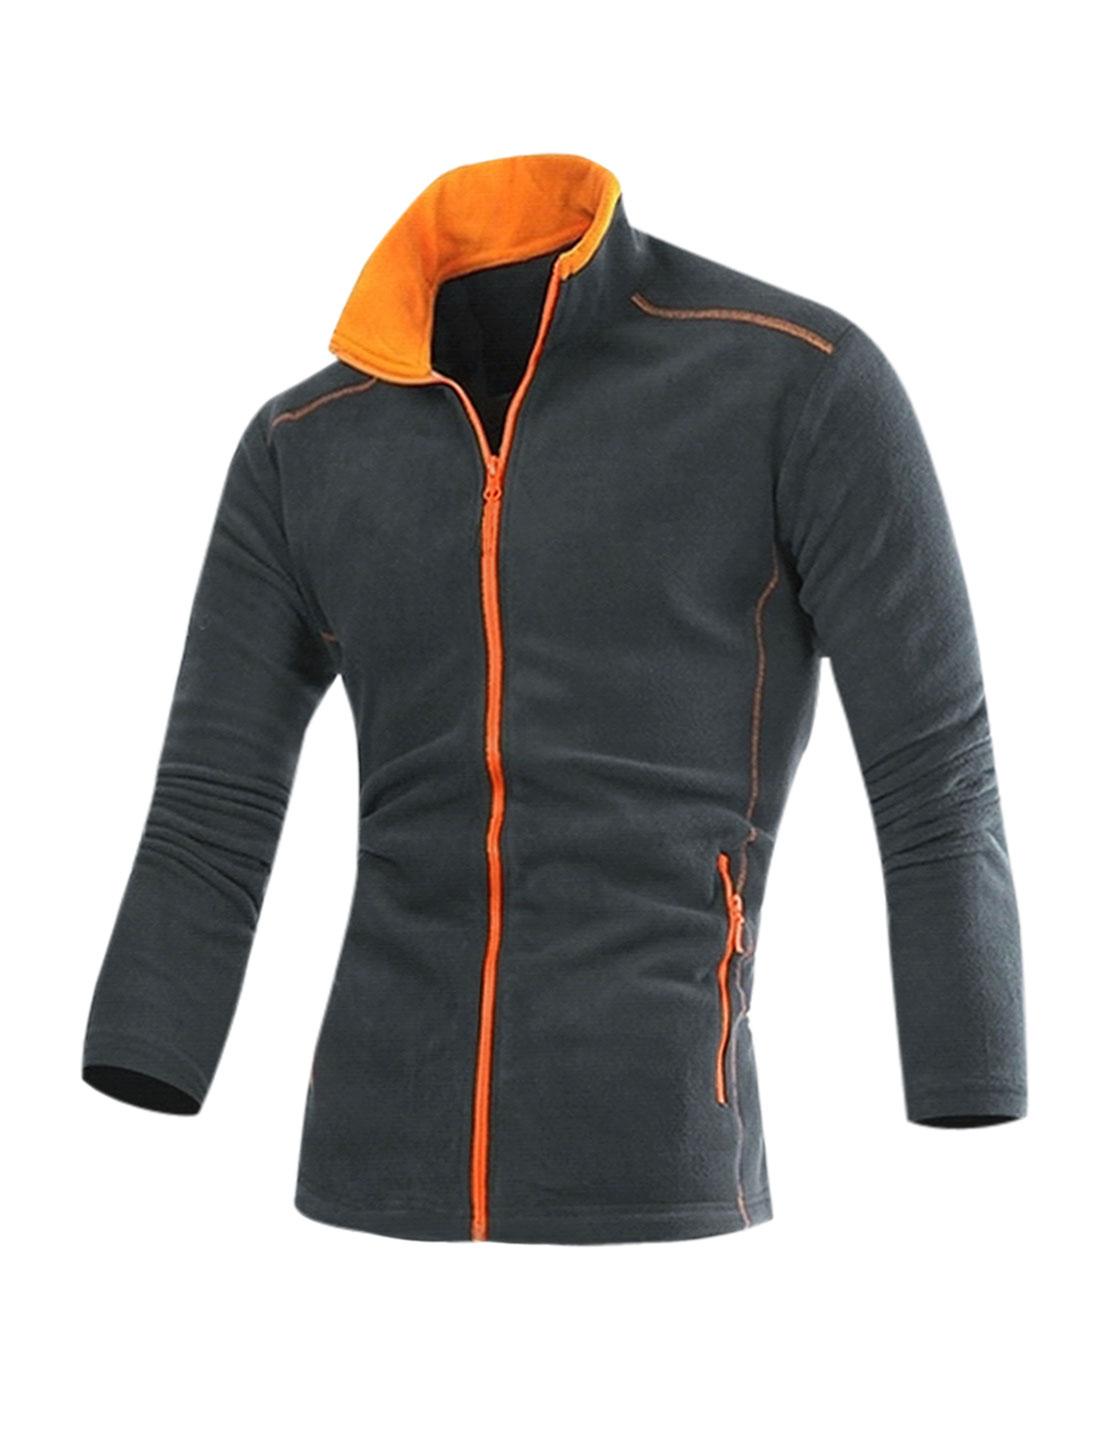 Men Long Sleeves Stand Collar Pocketed Casual Fleece Jacket Dark Gray M